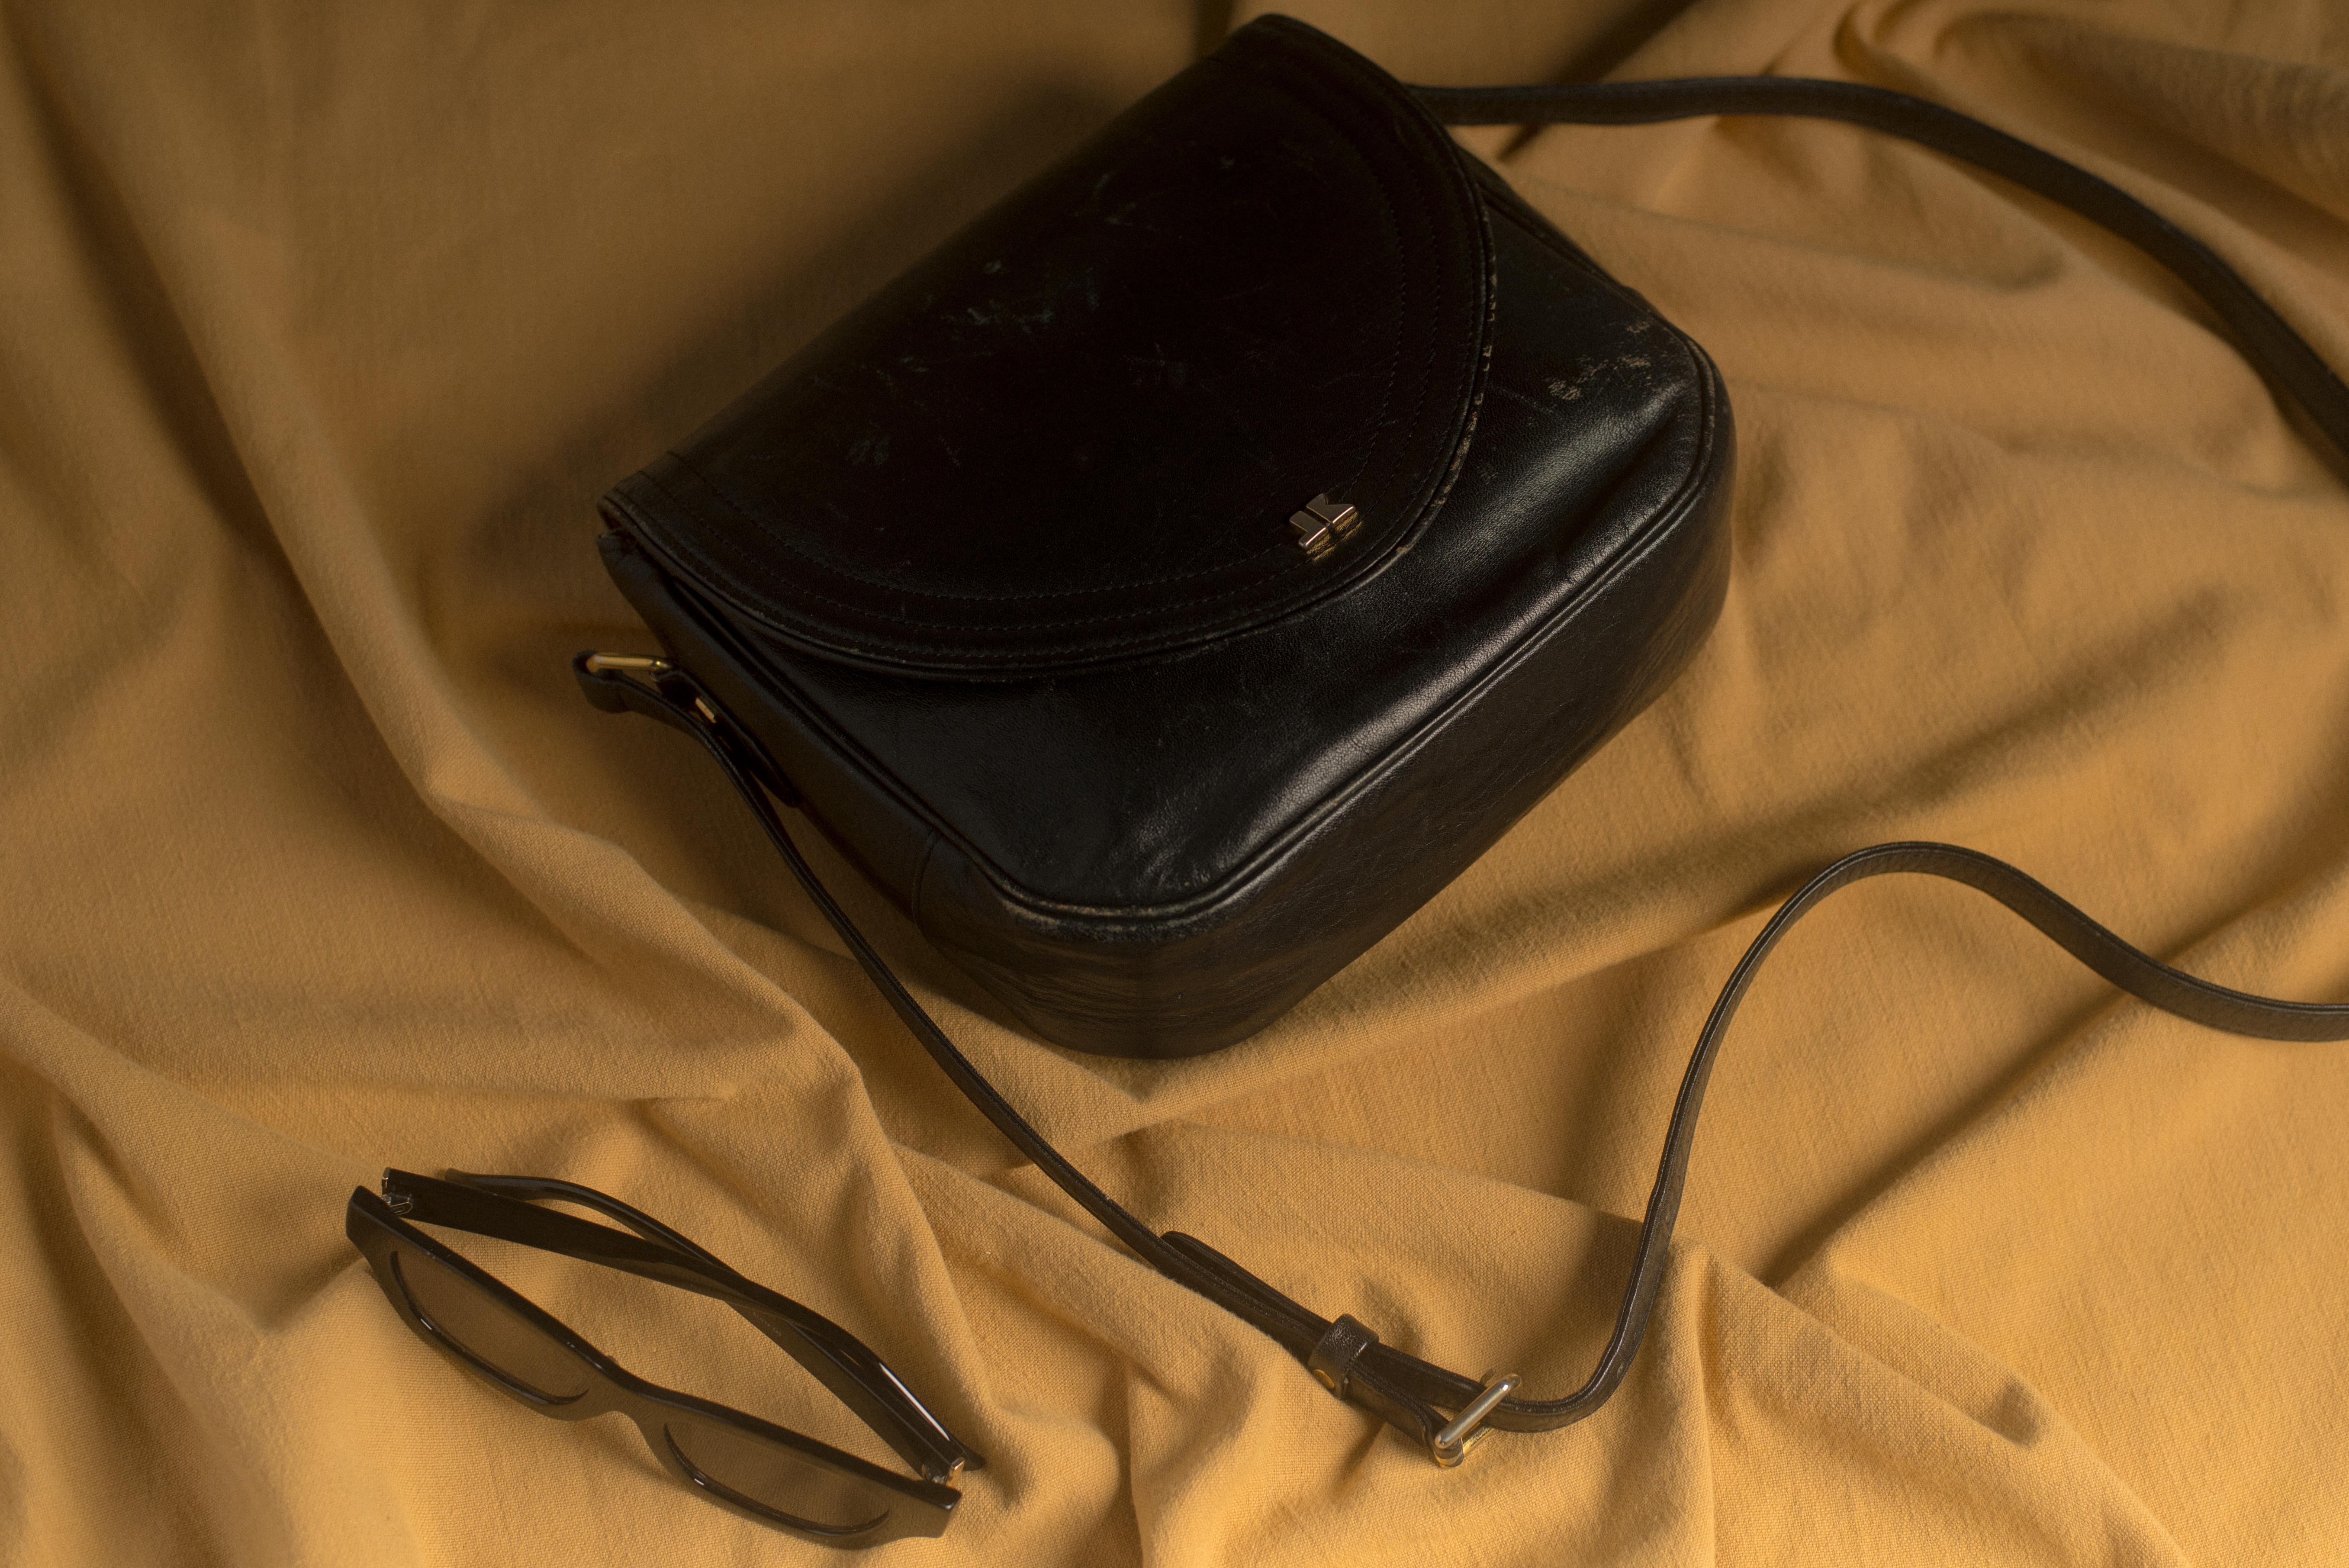 A black handbag sits against a canvas cloth with a pair of black sunglasses.